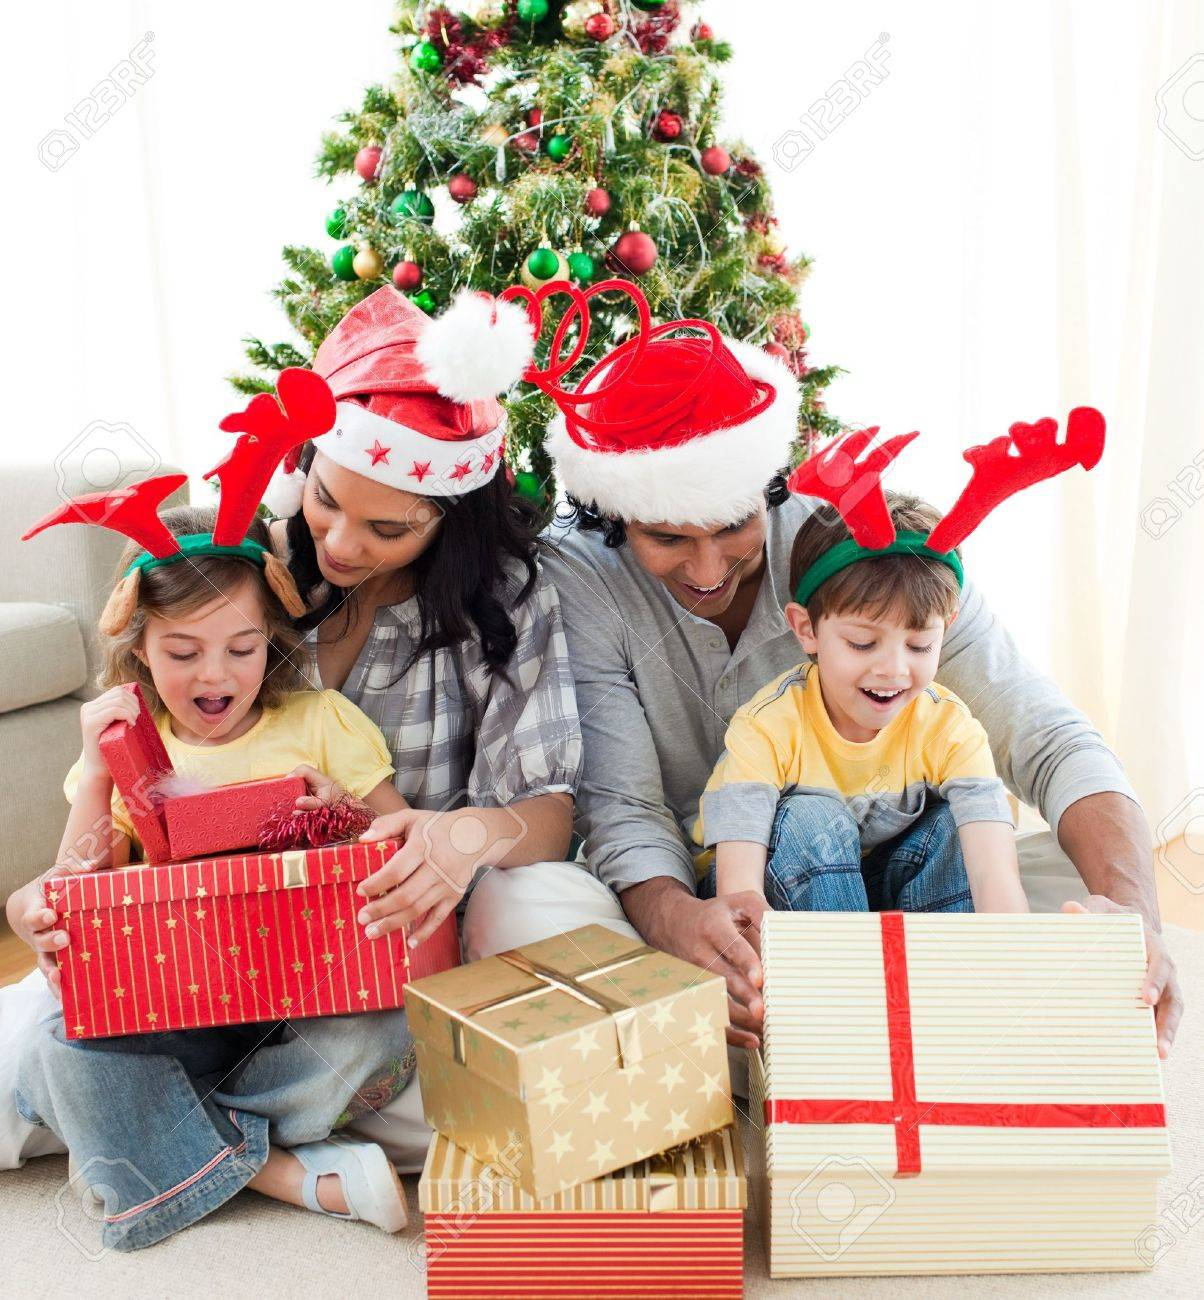 Family decorating a Christmas tree Stock Photo - 10258459